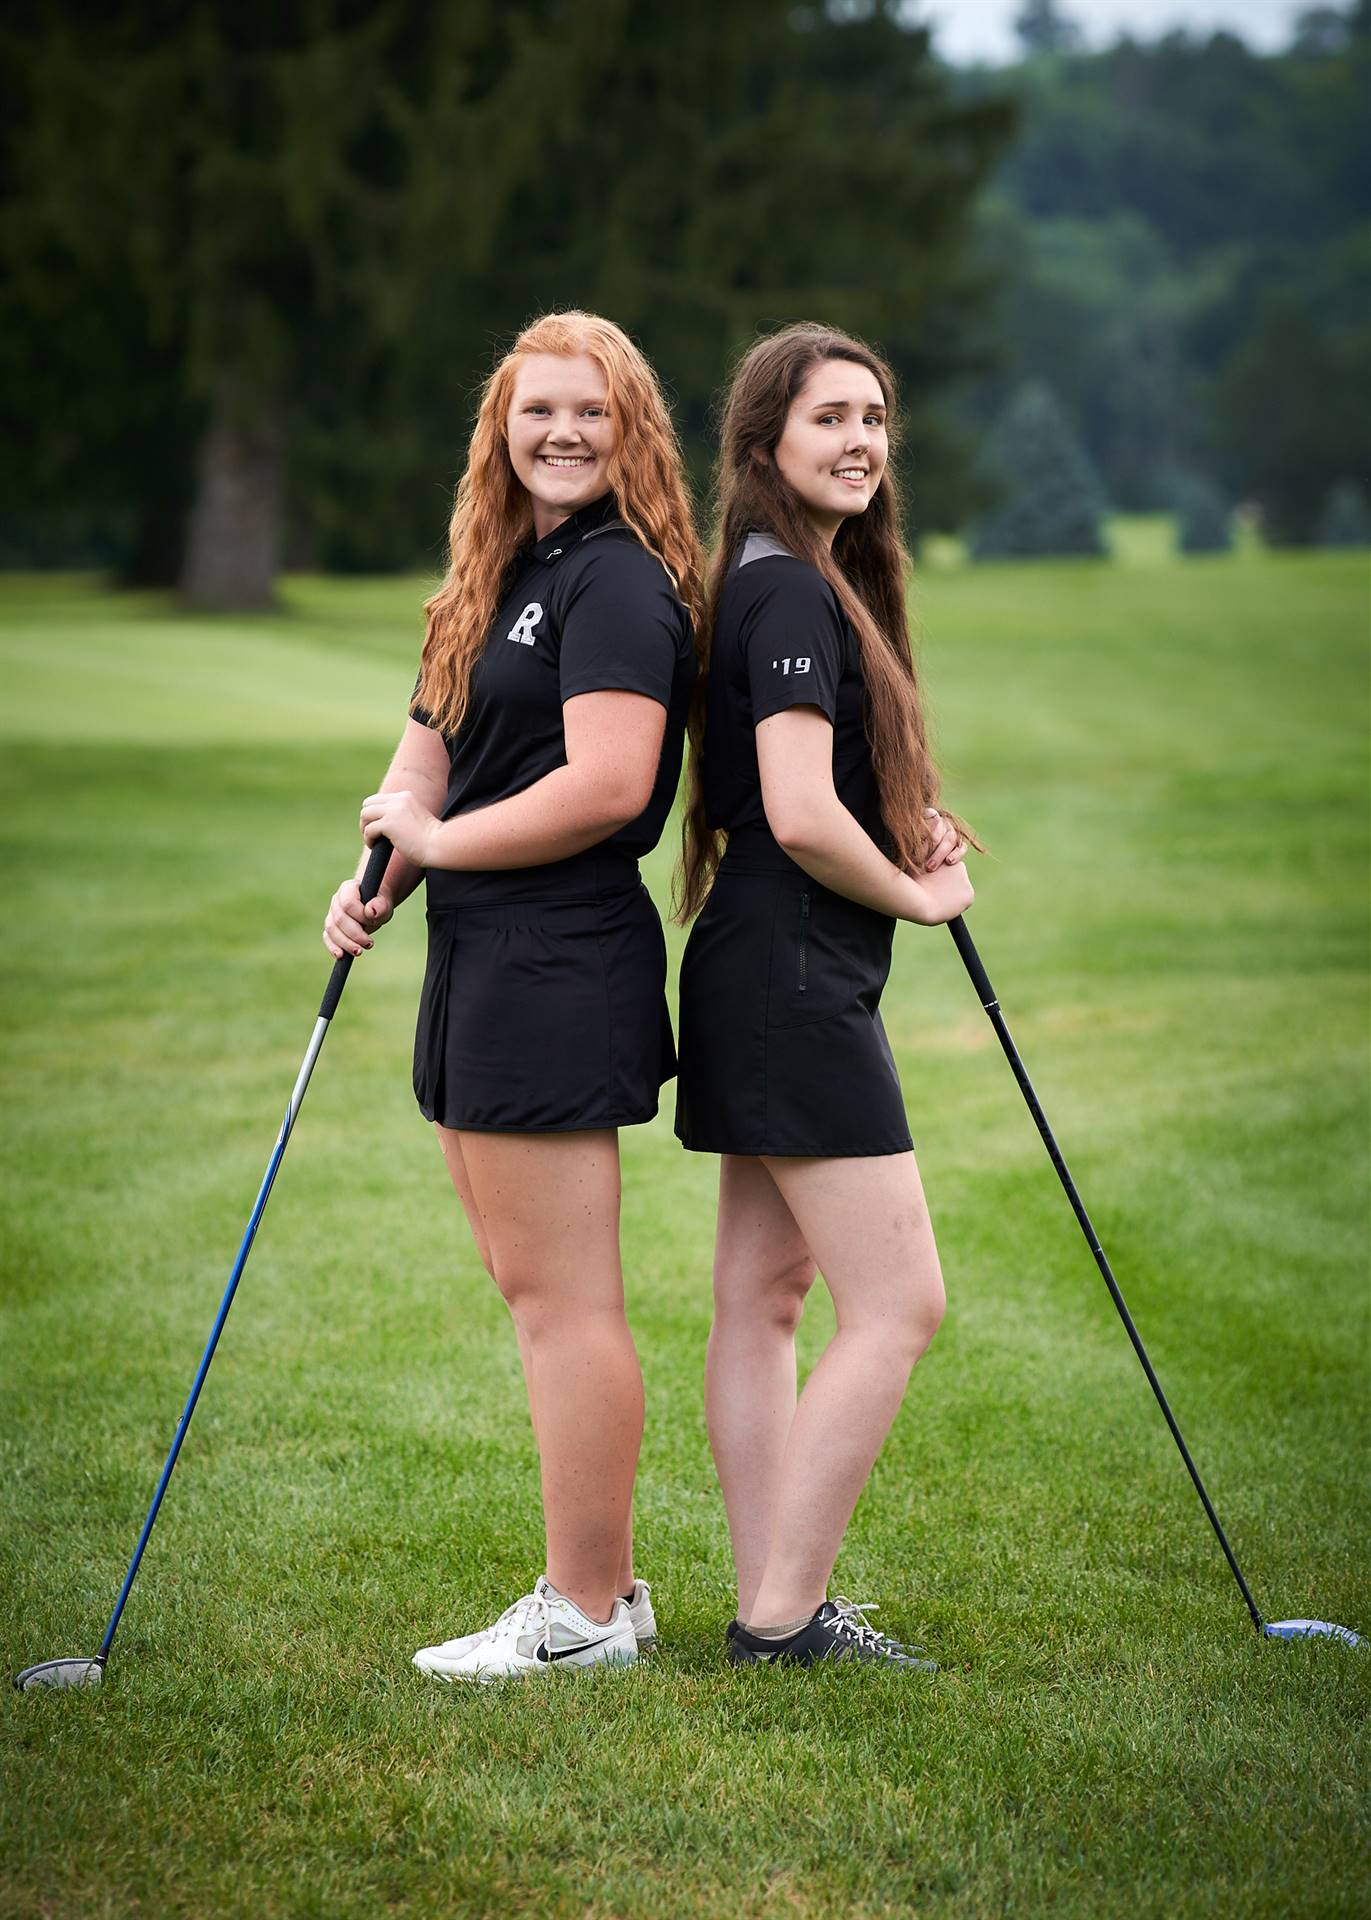 HS Girls Golf - Seniors